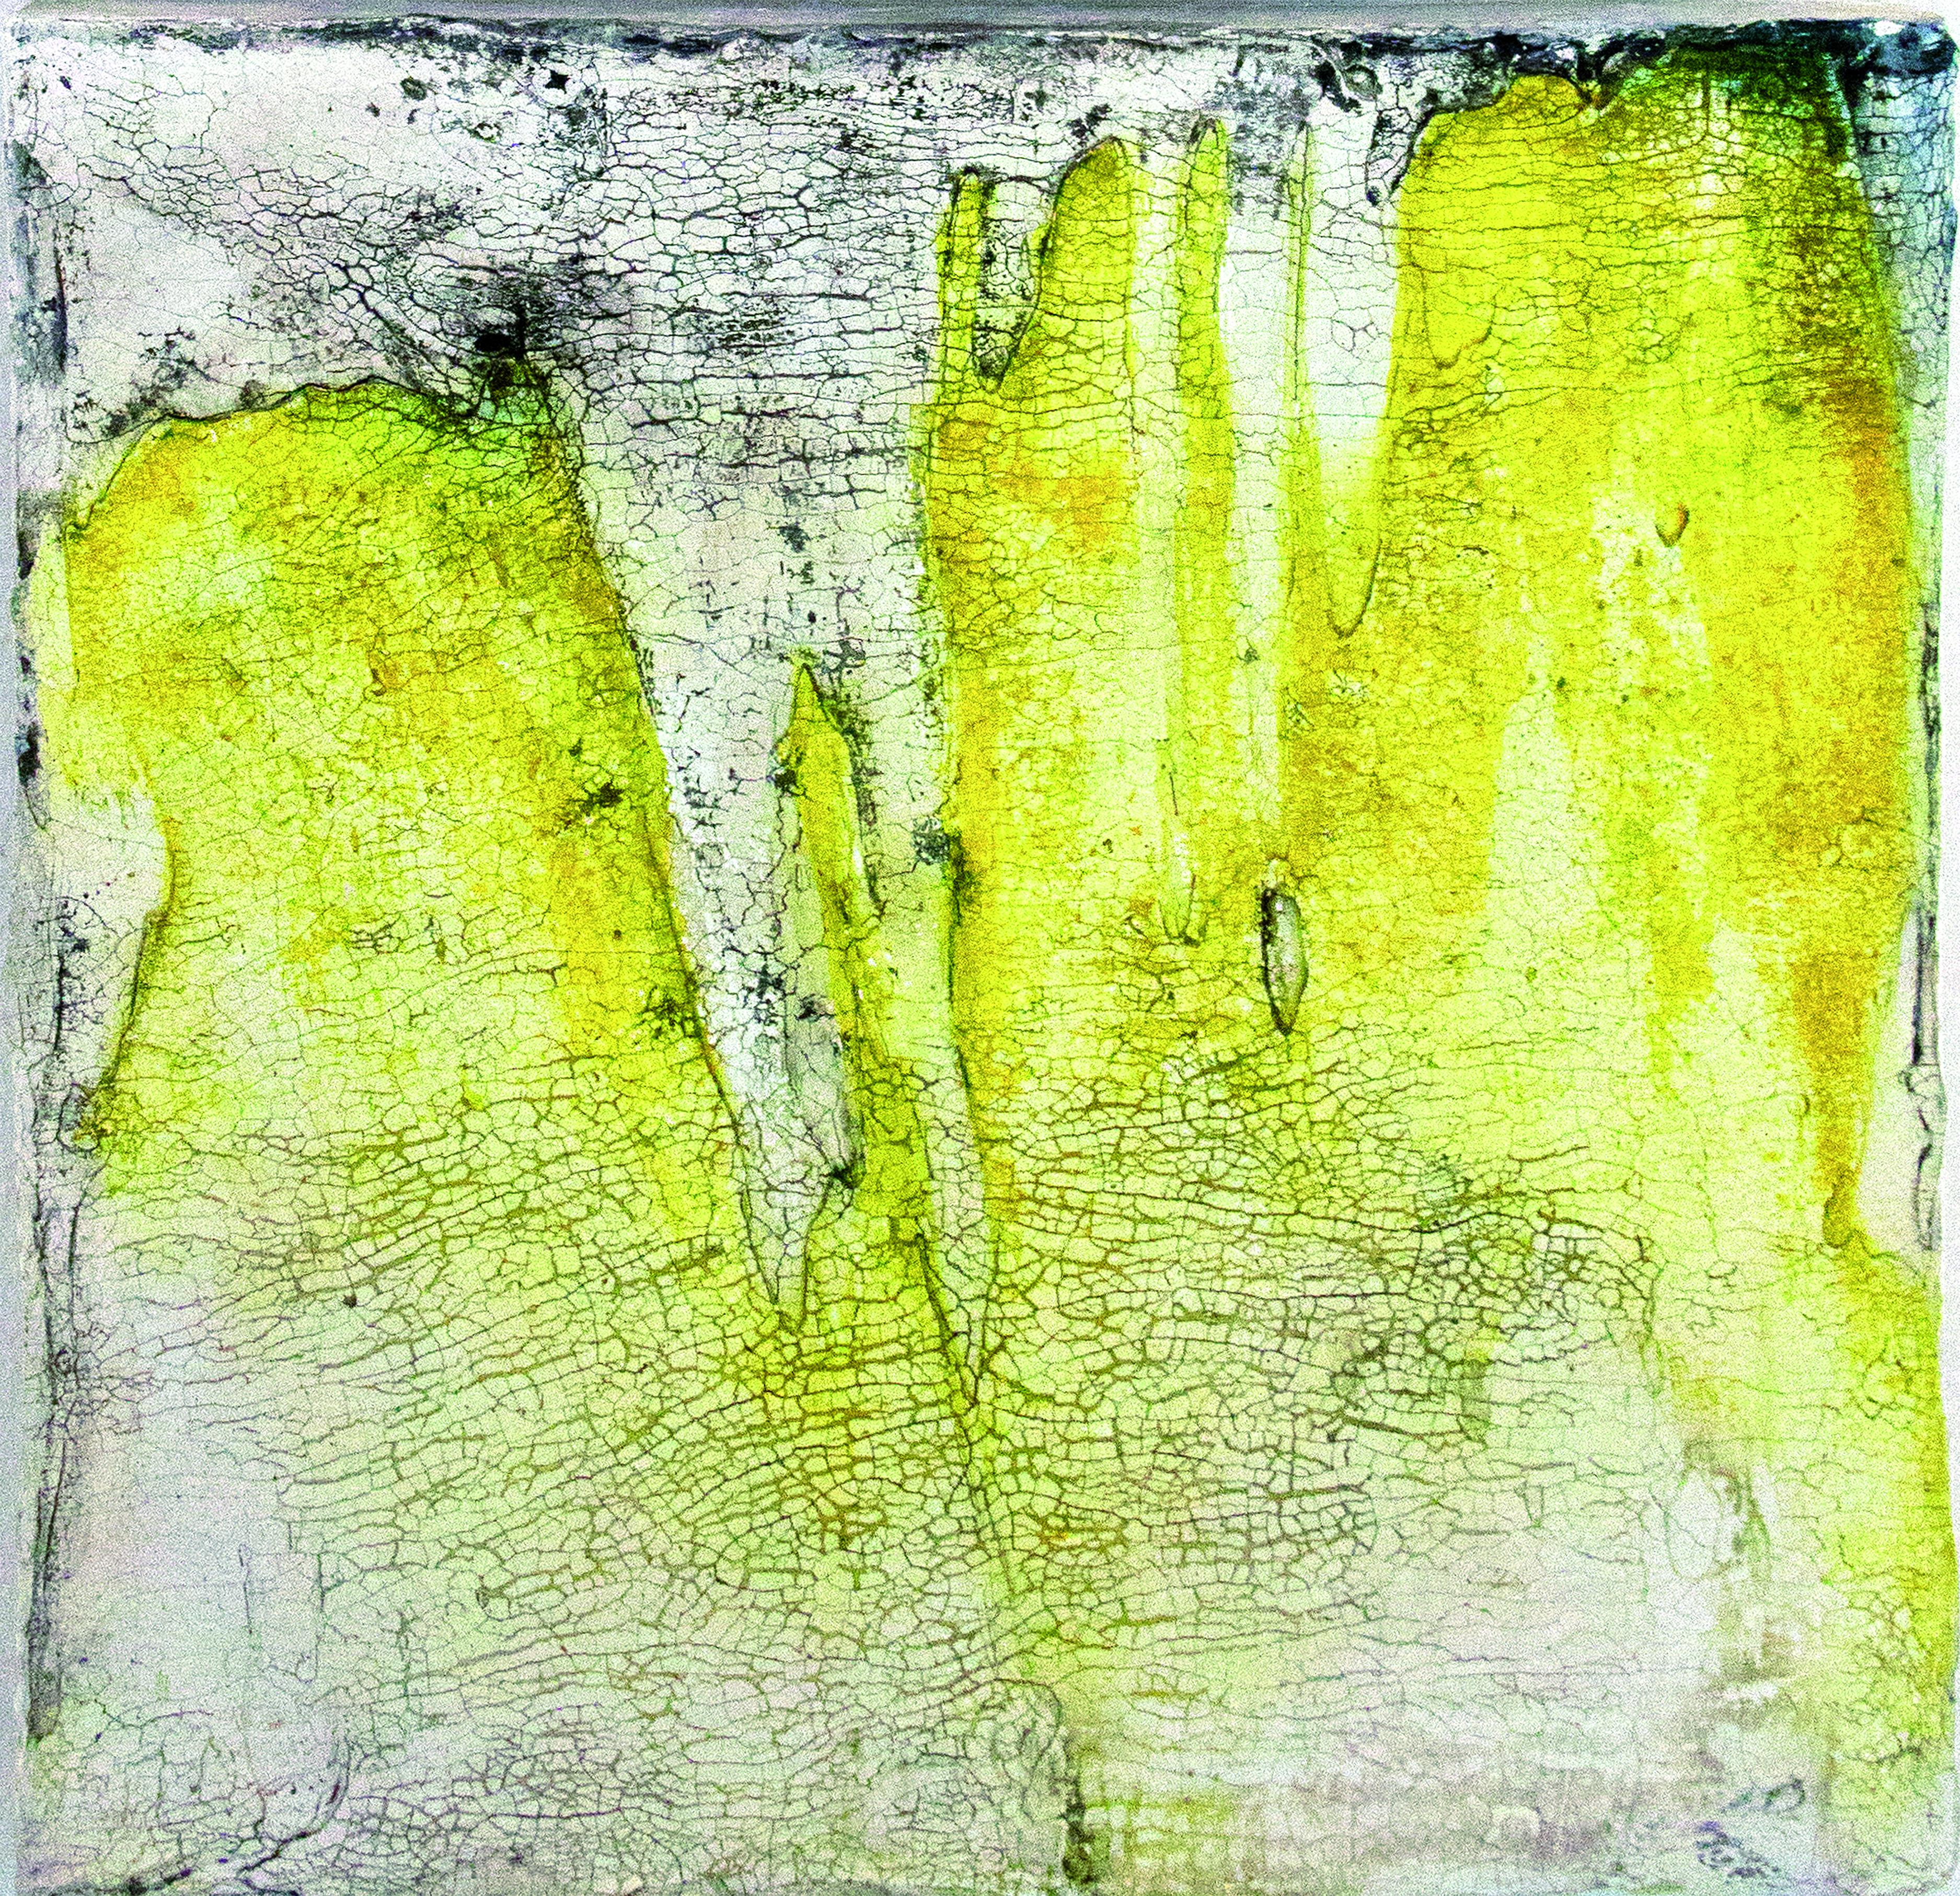 Werknr. SK_122| O.T. | Intonaco, Öl, Wachs auf Holz | 30 x 30 cm | 2015